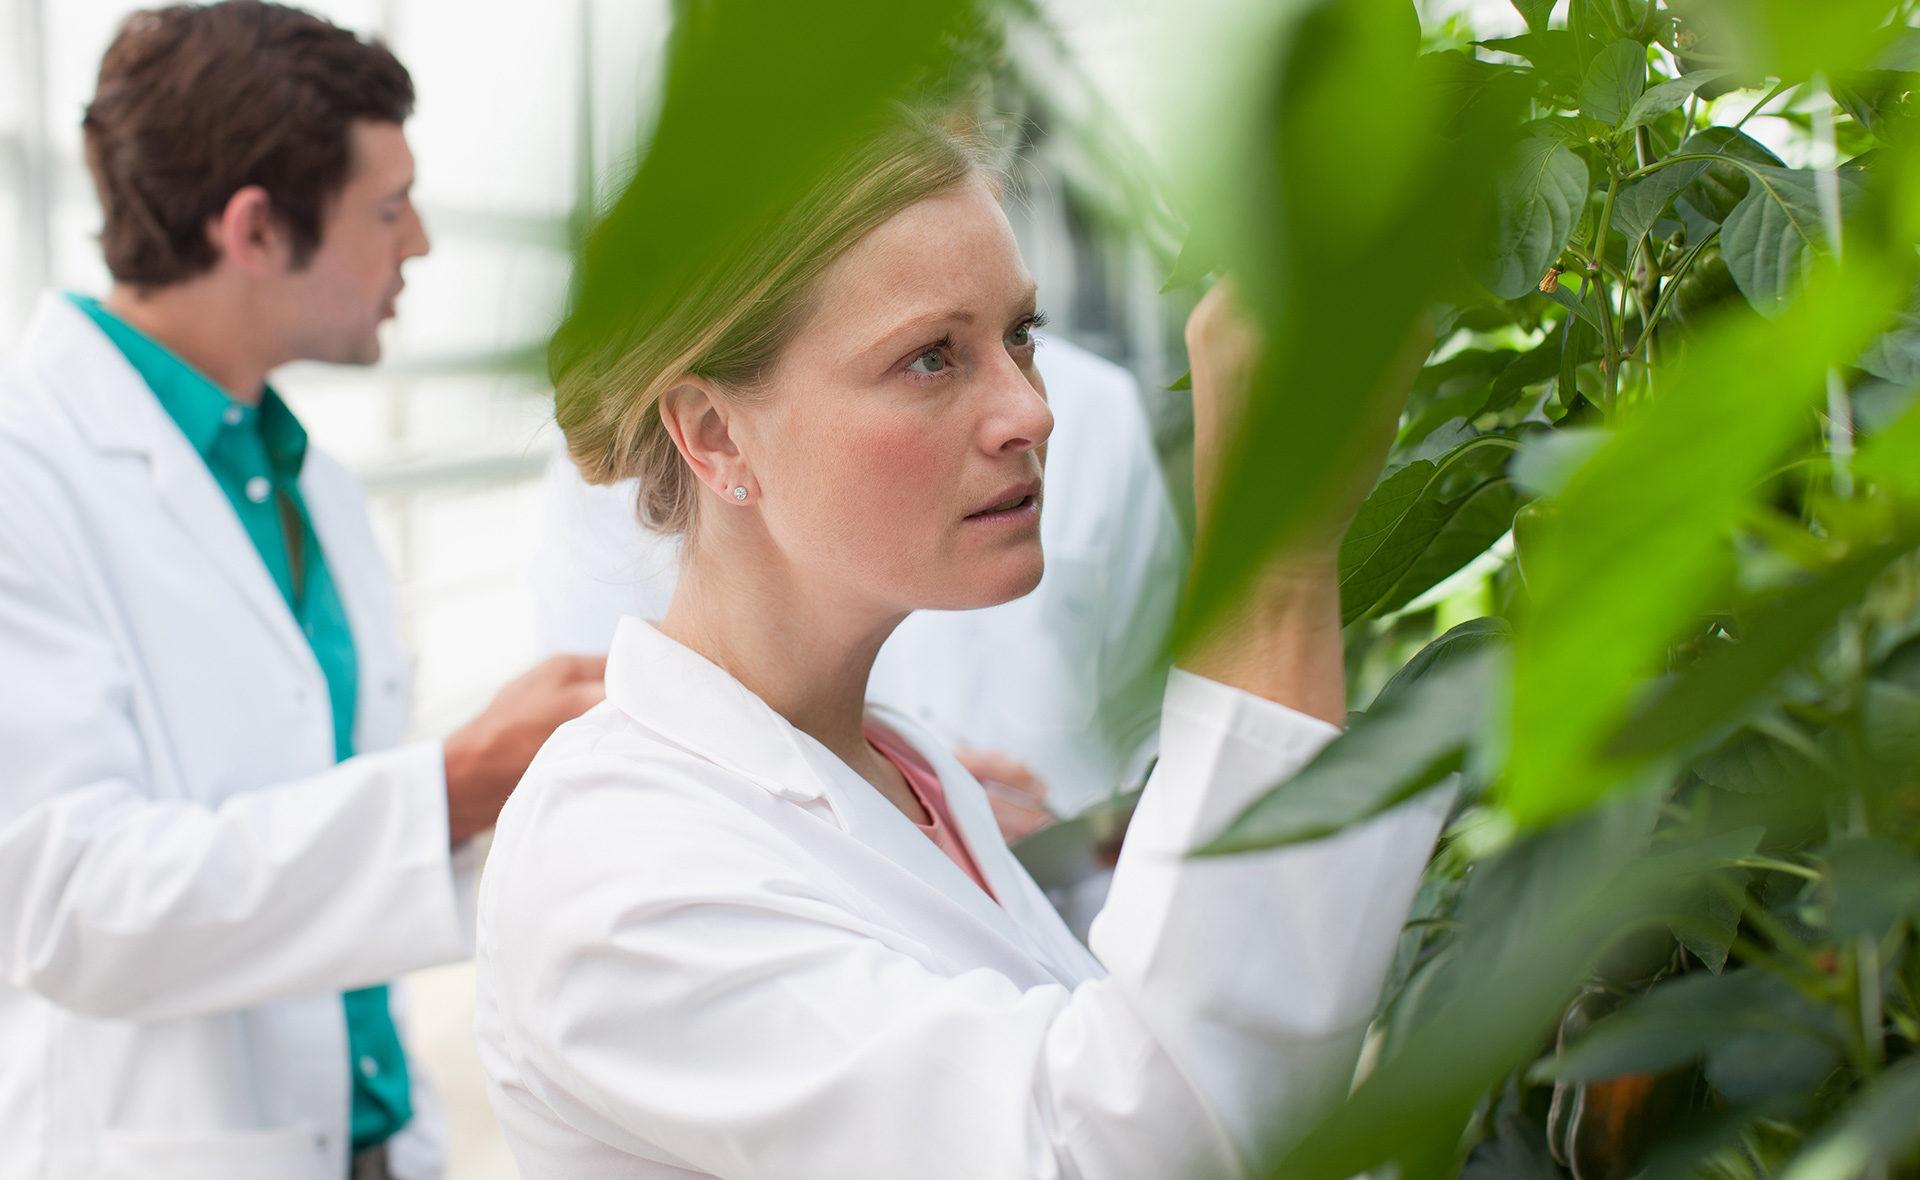 BBVA-ferrer-farmaceutica-acuerdo-sostenible